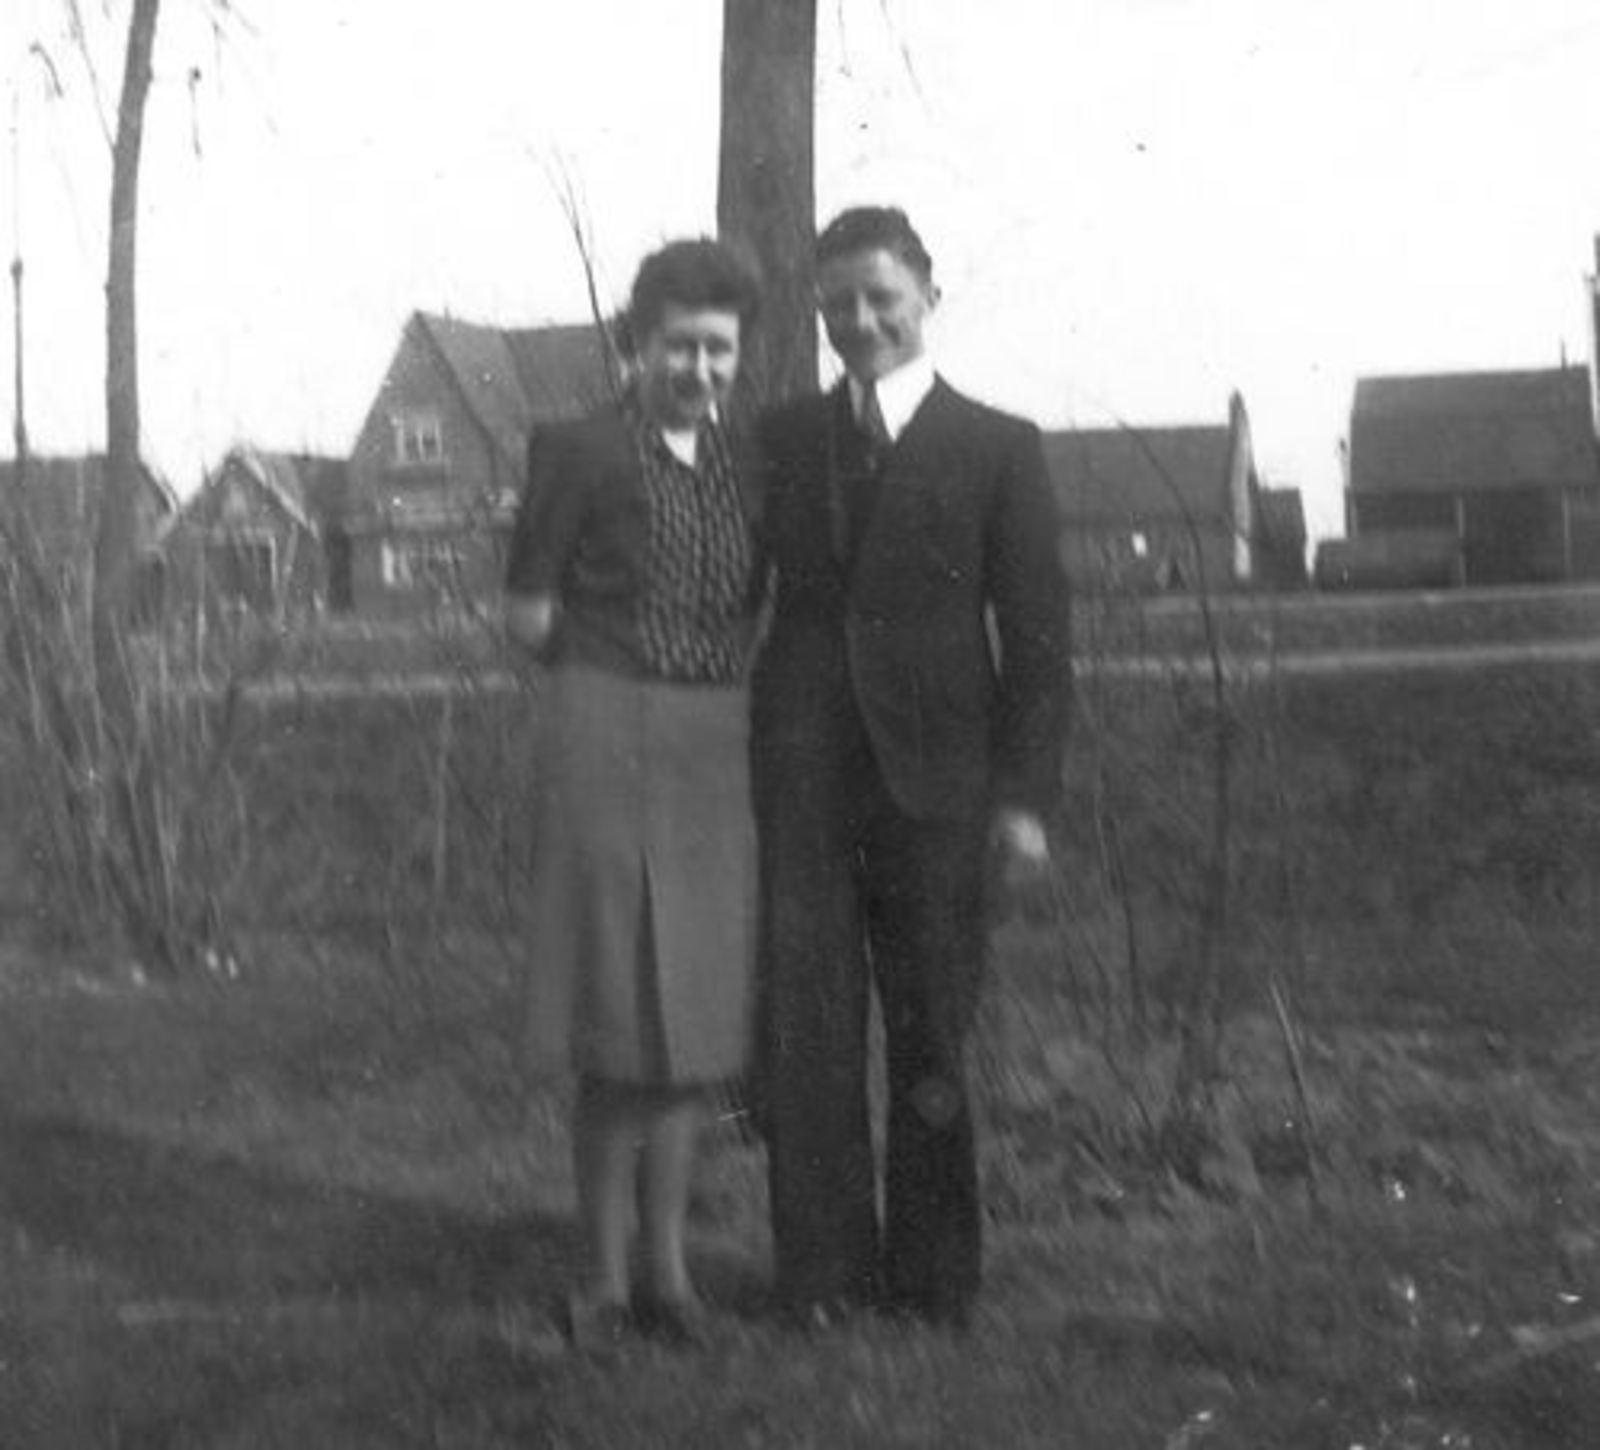 Calvelage Greet 1920 1941± met Jan Tulen